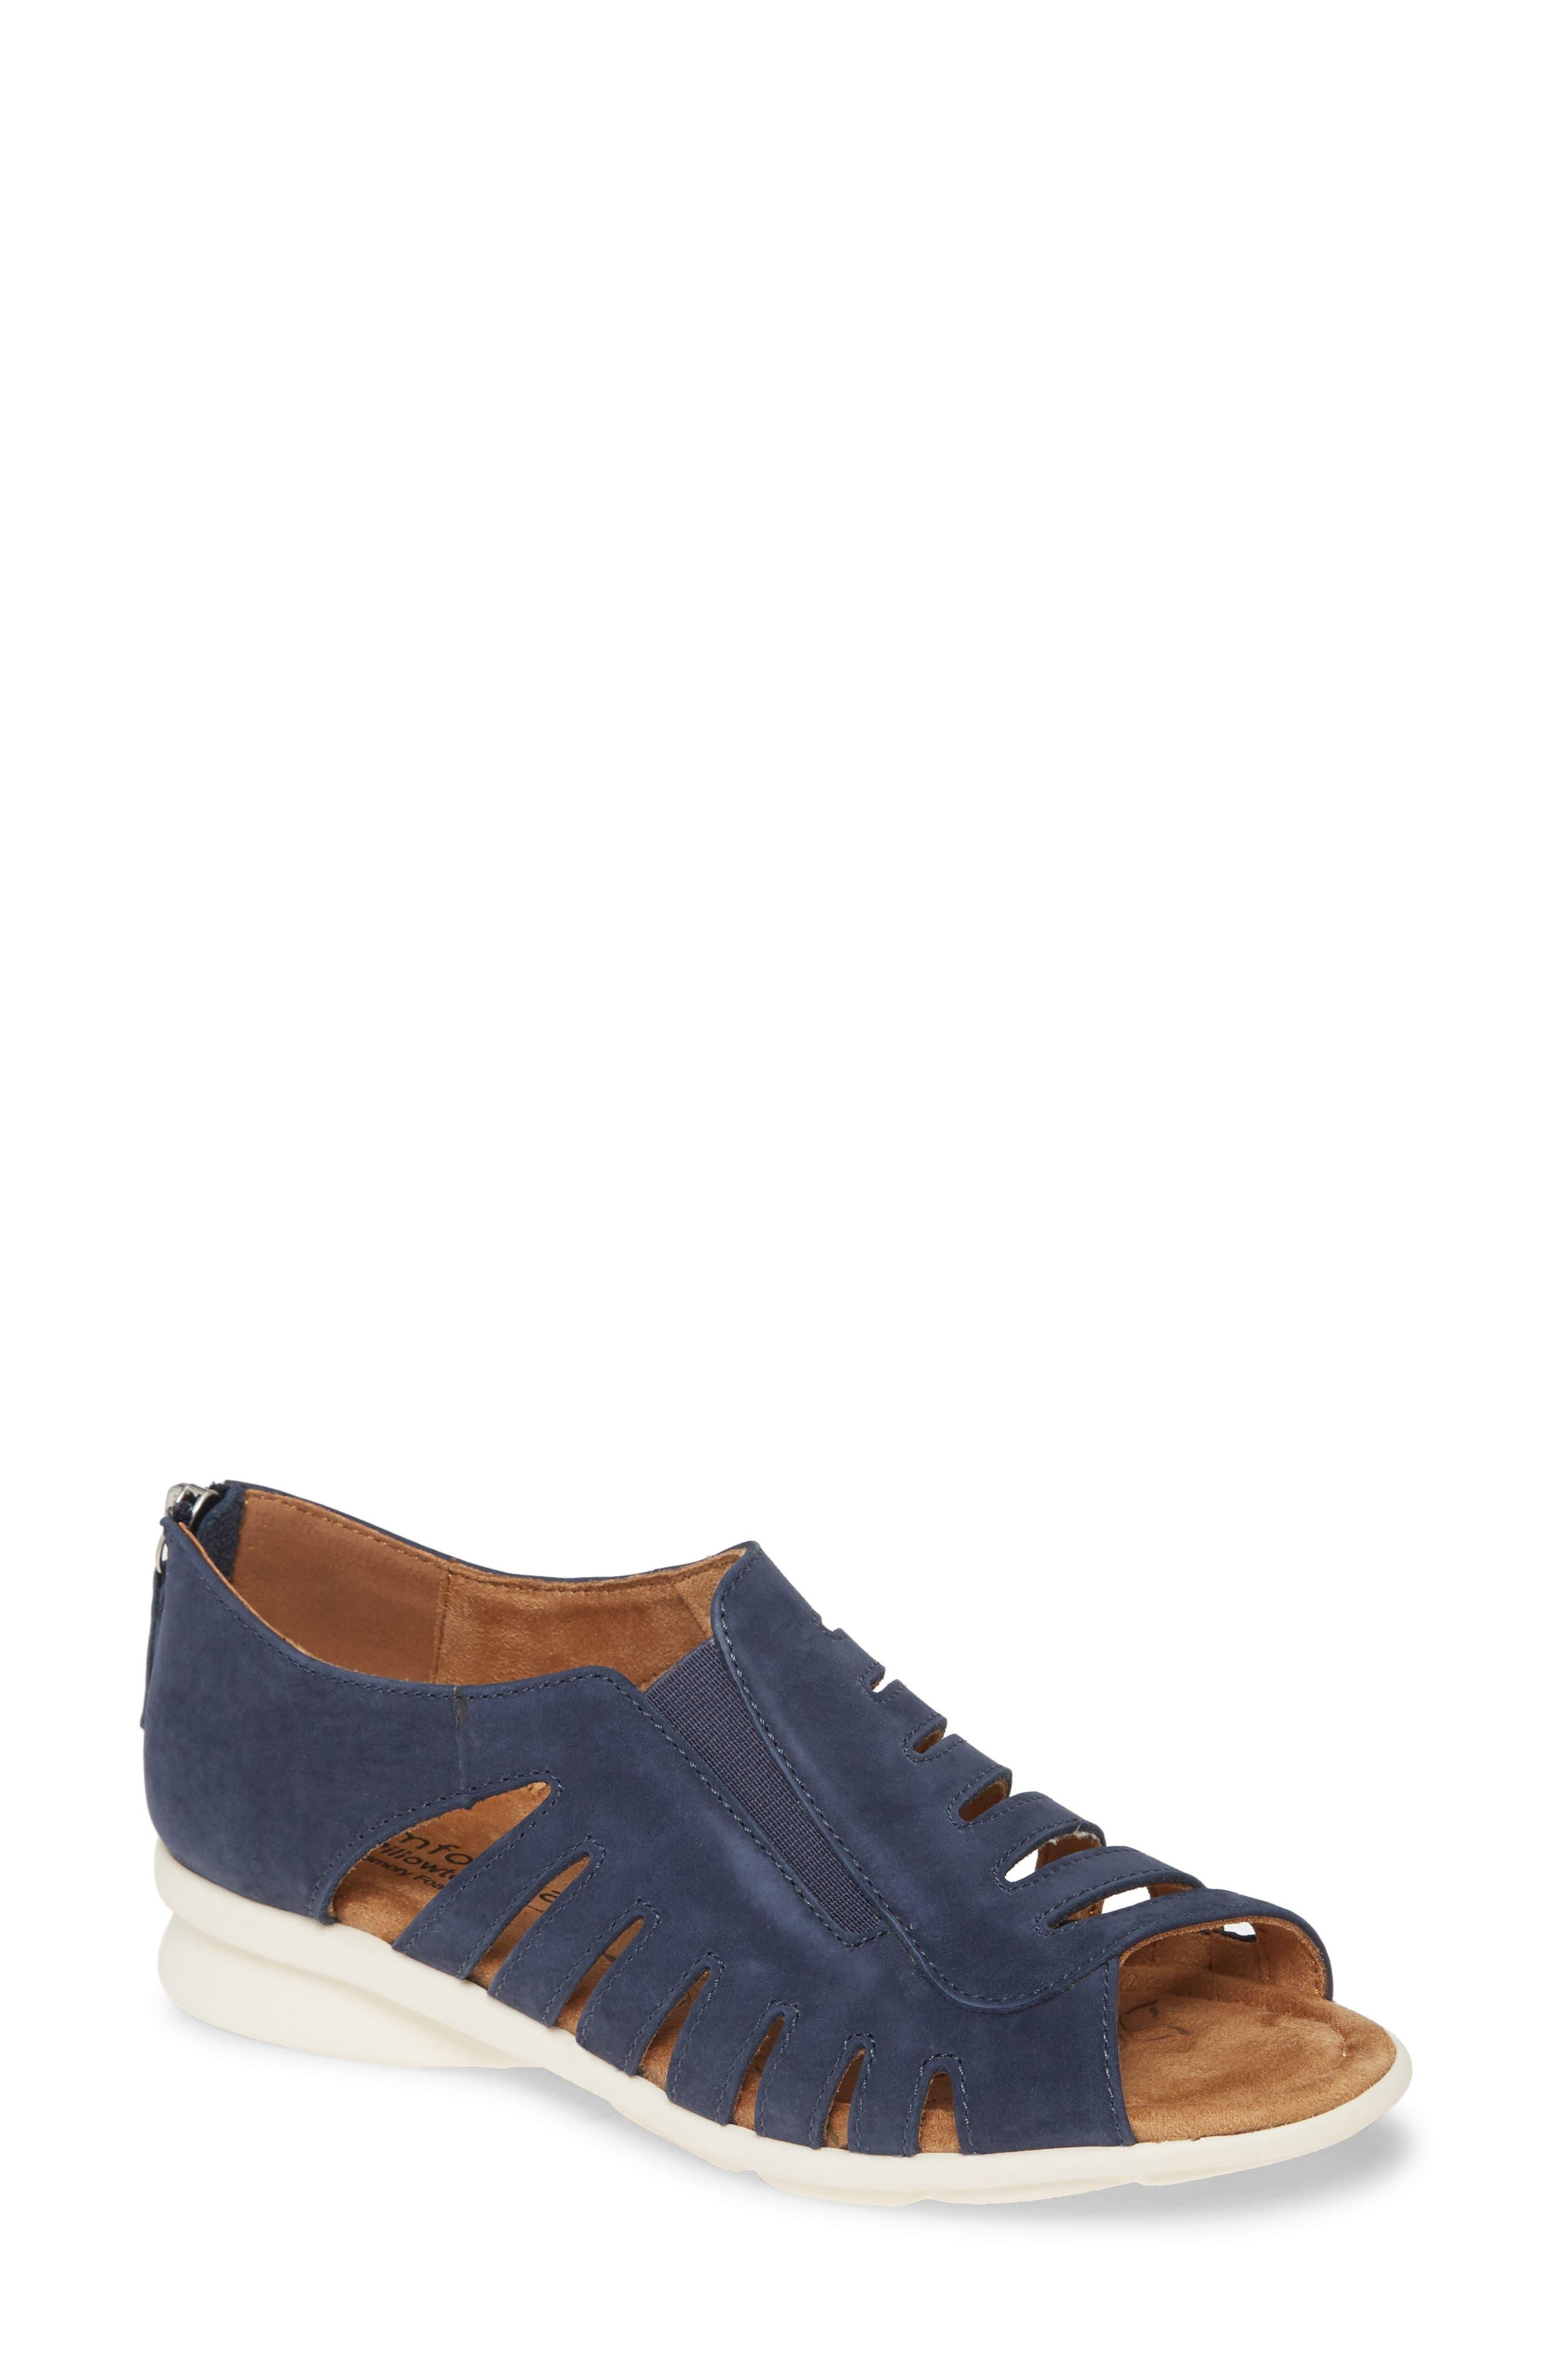 Parker Slip-On Sandal